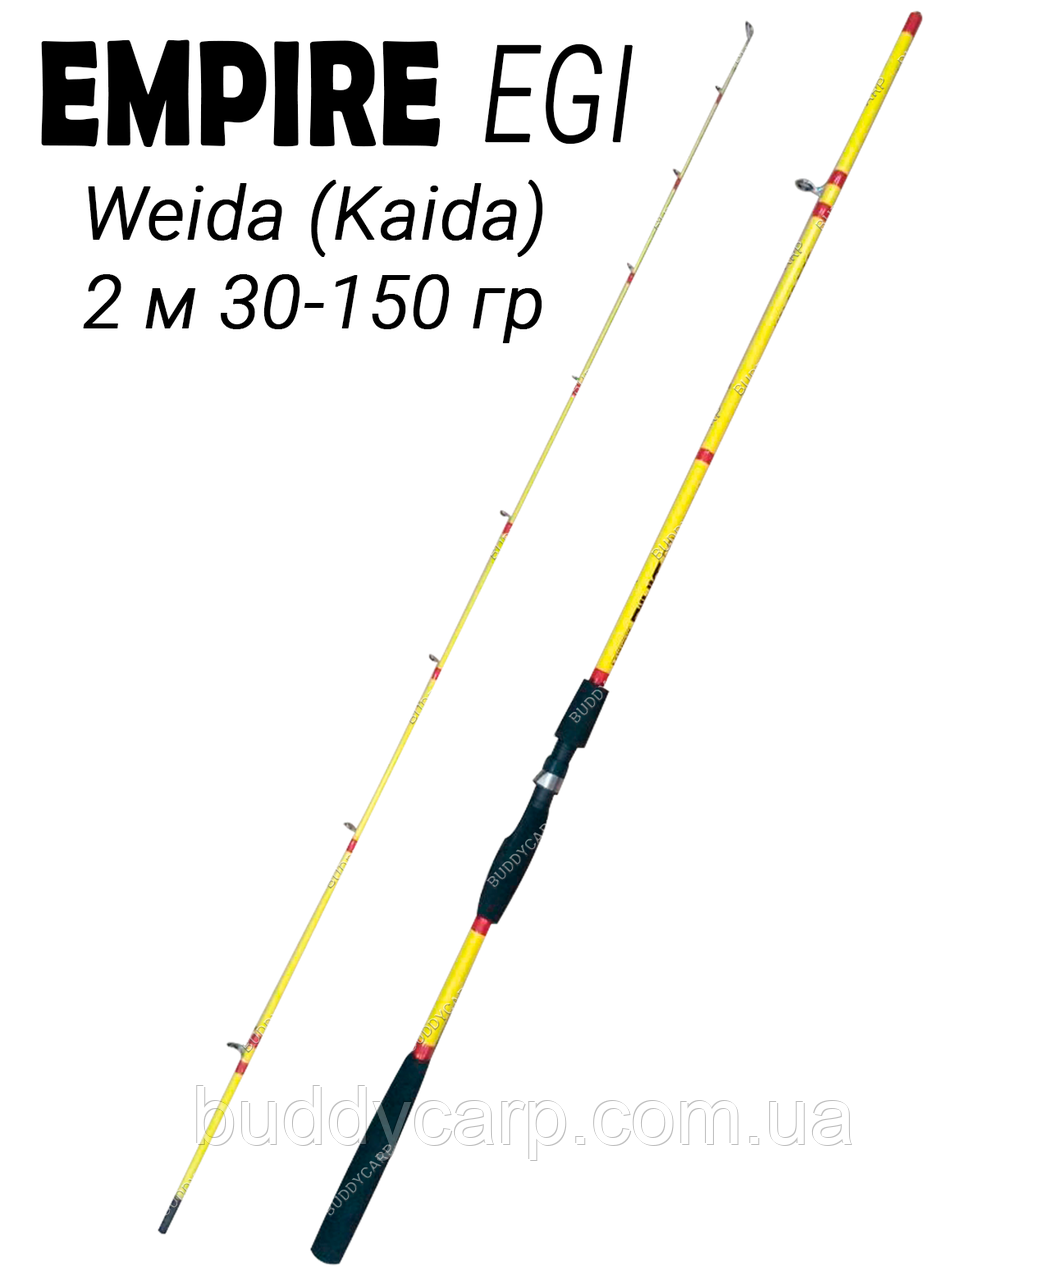 Удилище 2 м тест 30-150 гр Empire Egi Weida (Kaida)